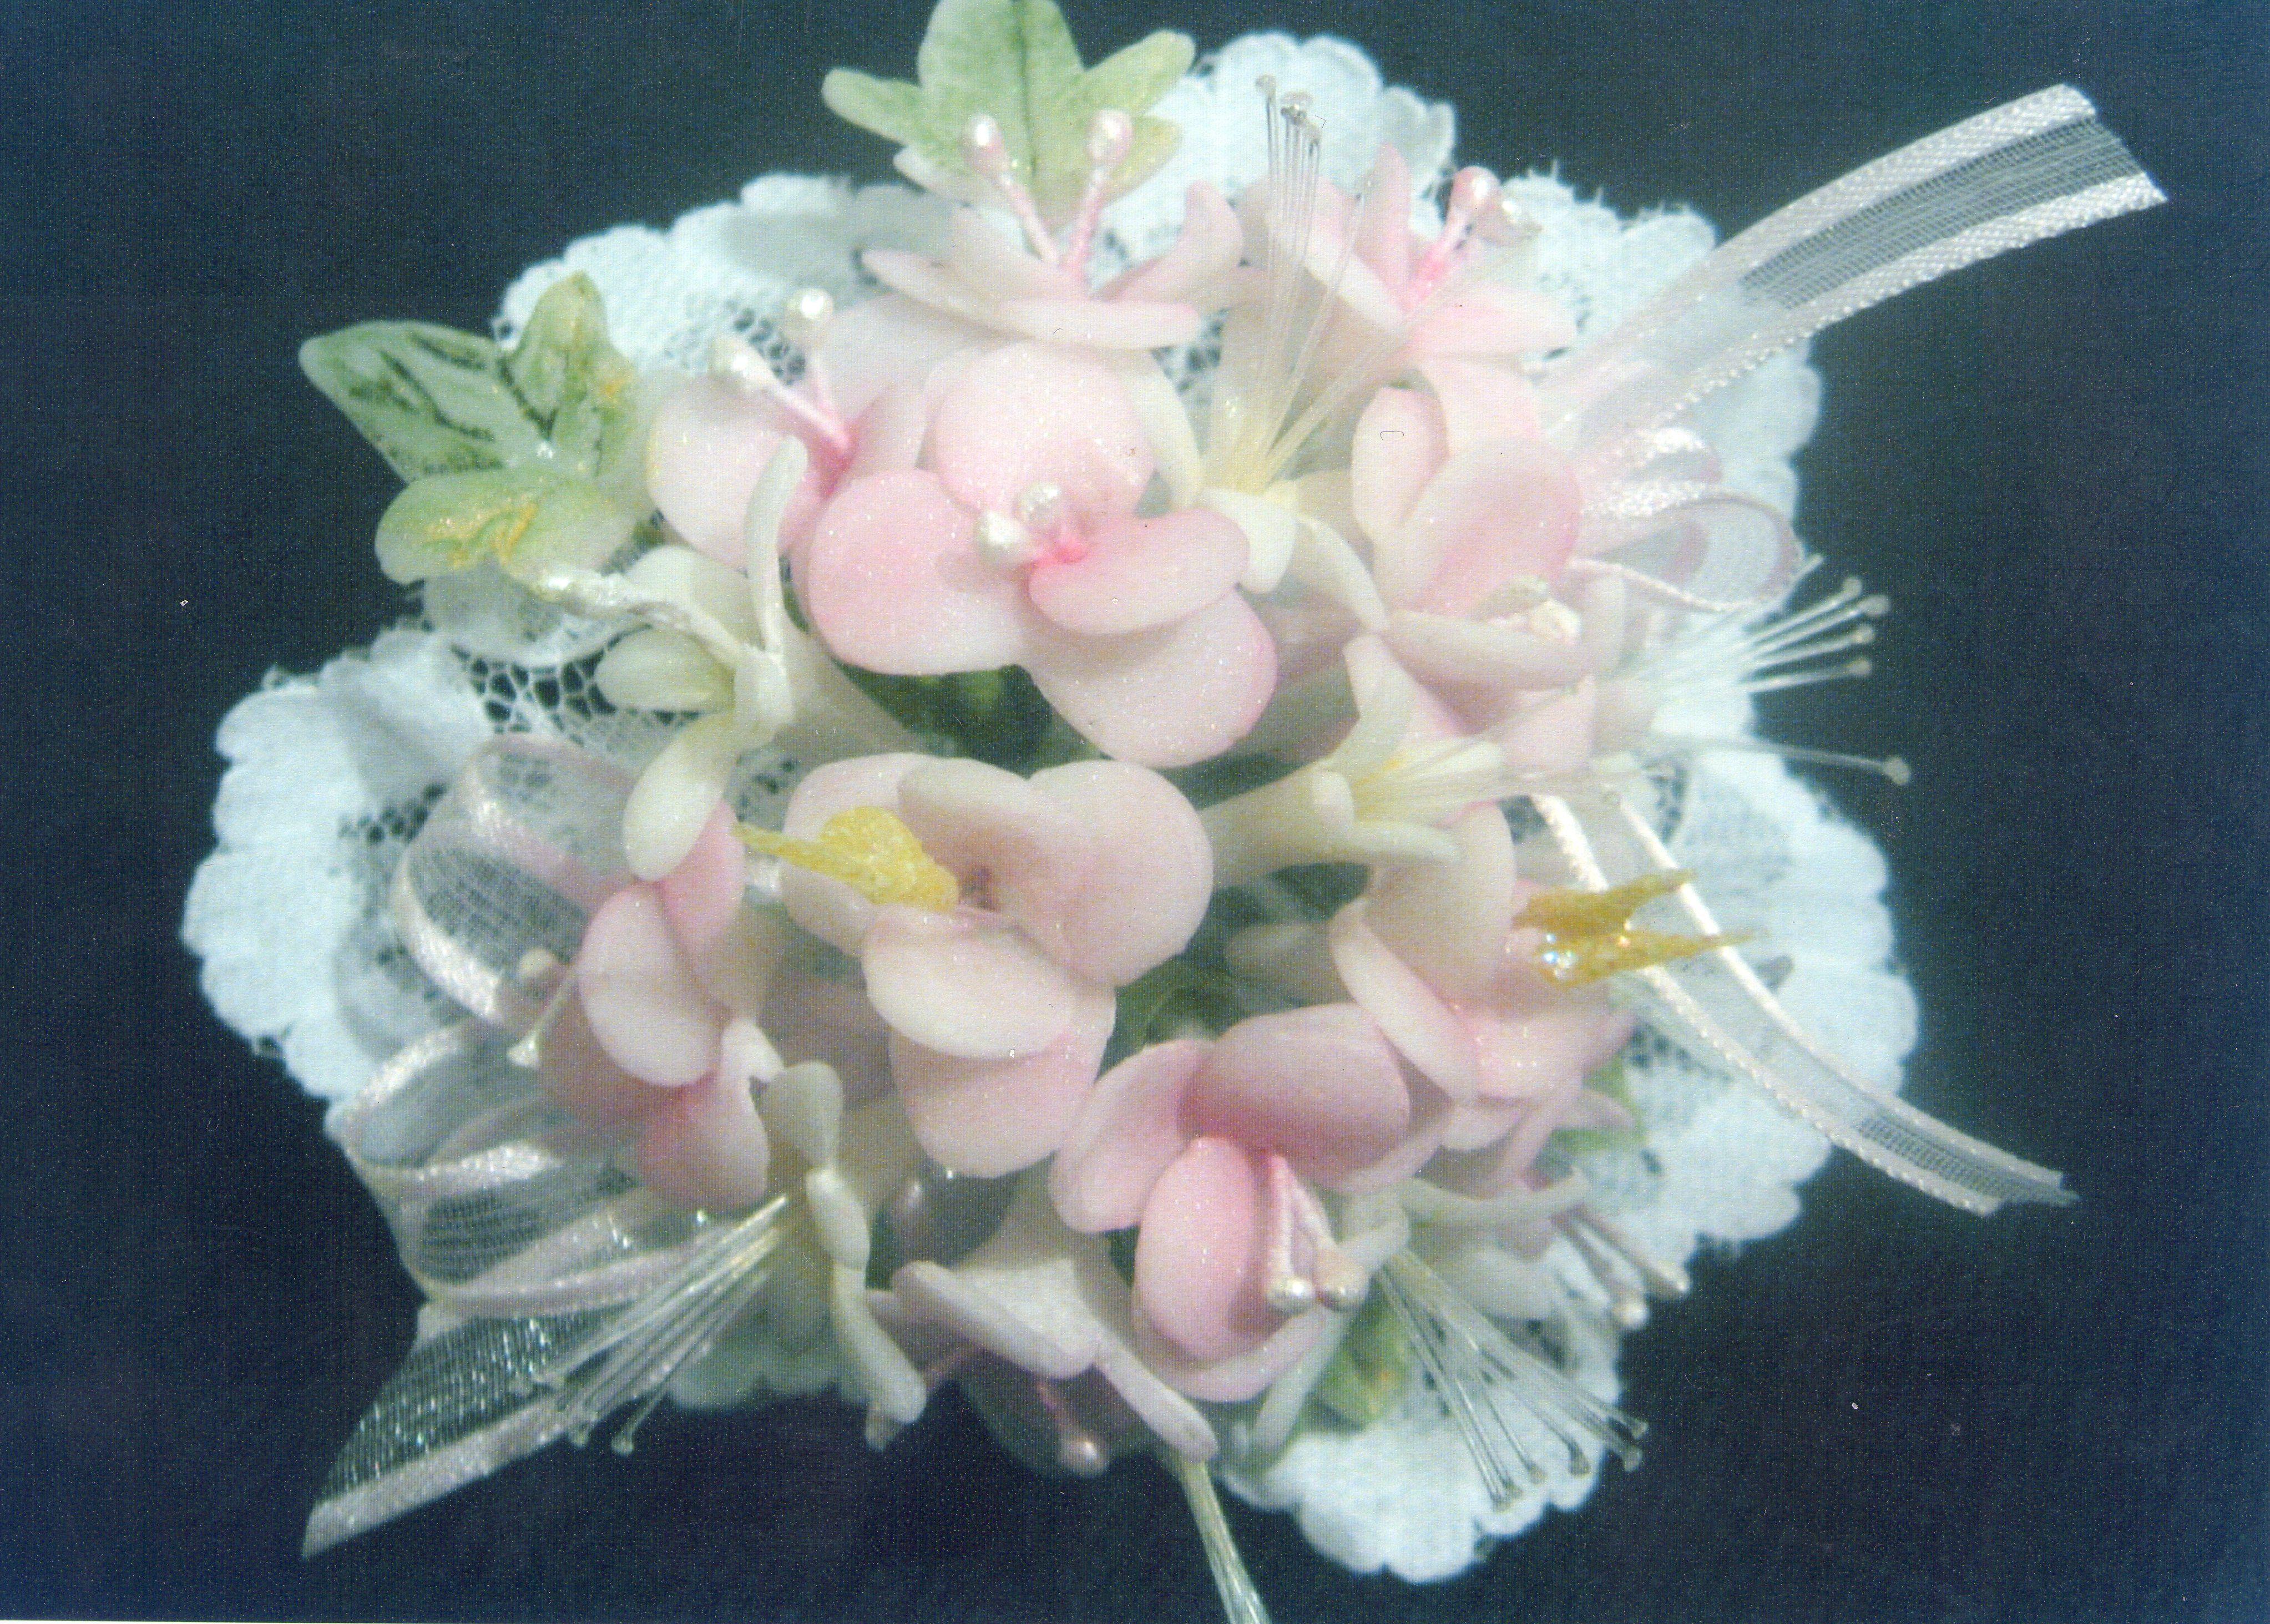 como hacer flores de porcelana fria sin moldes - Google Search ...